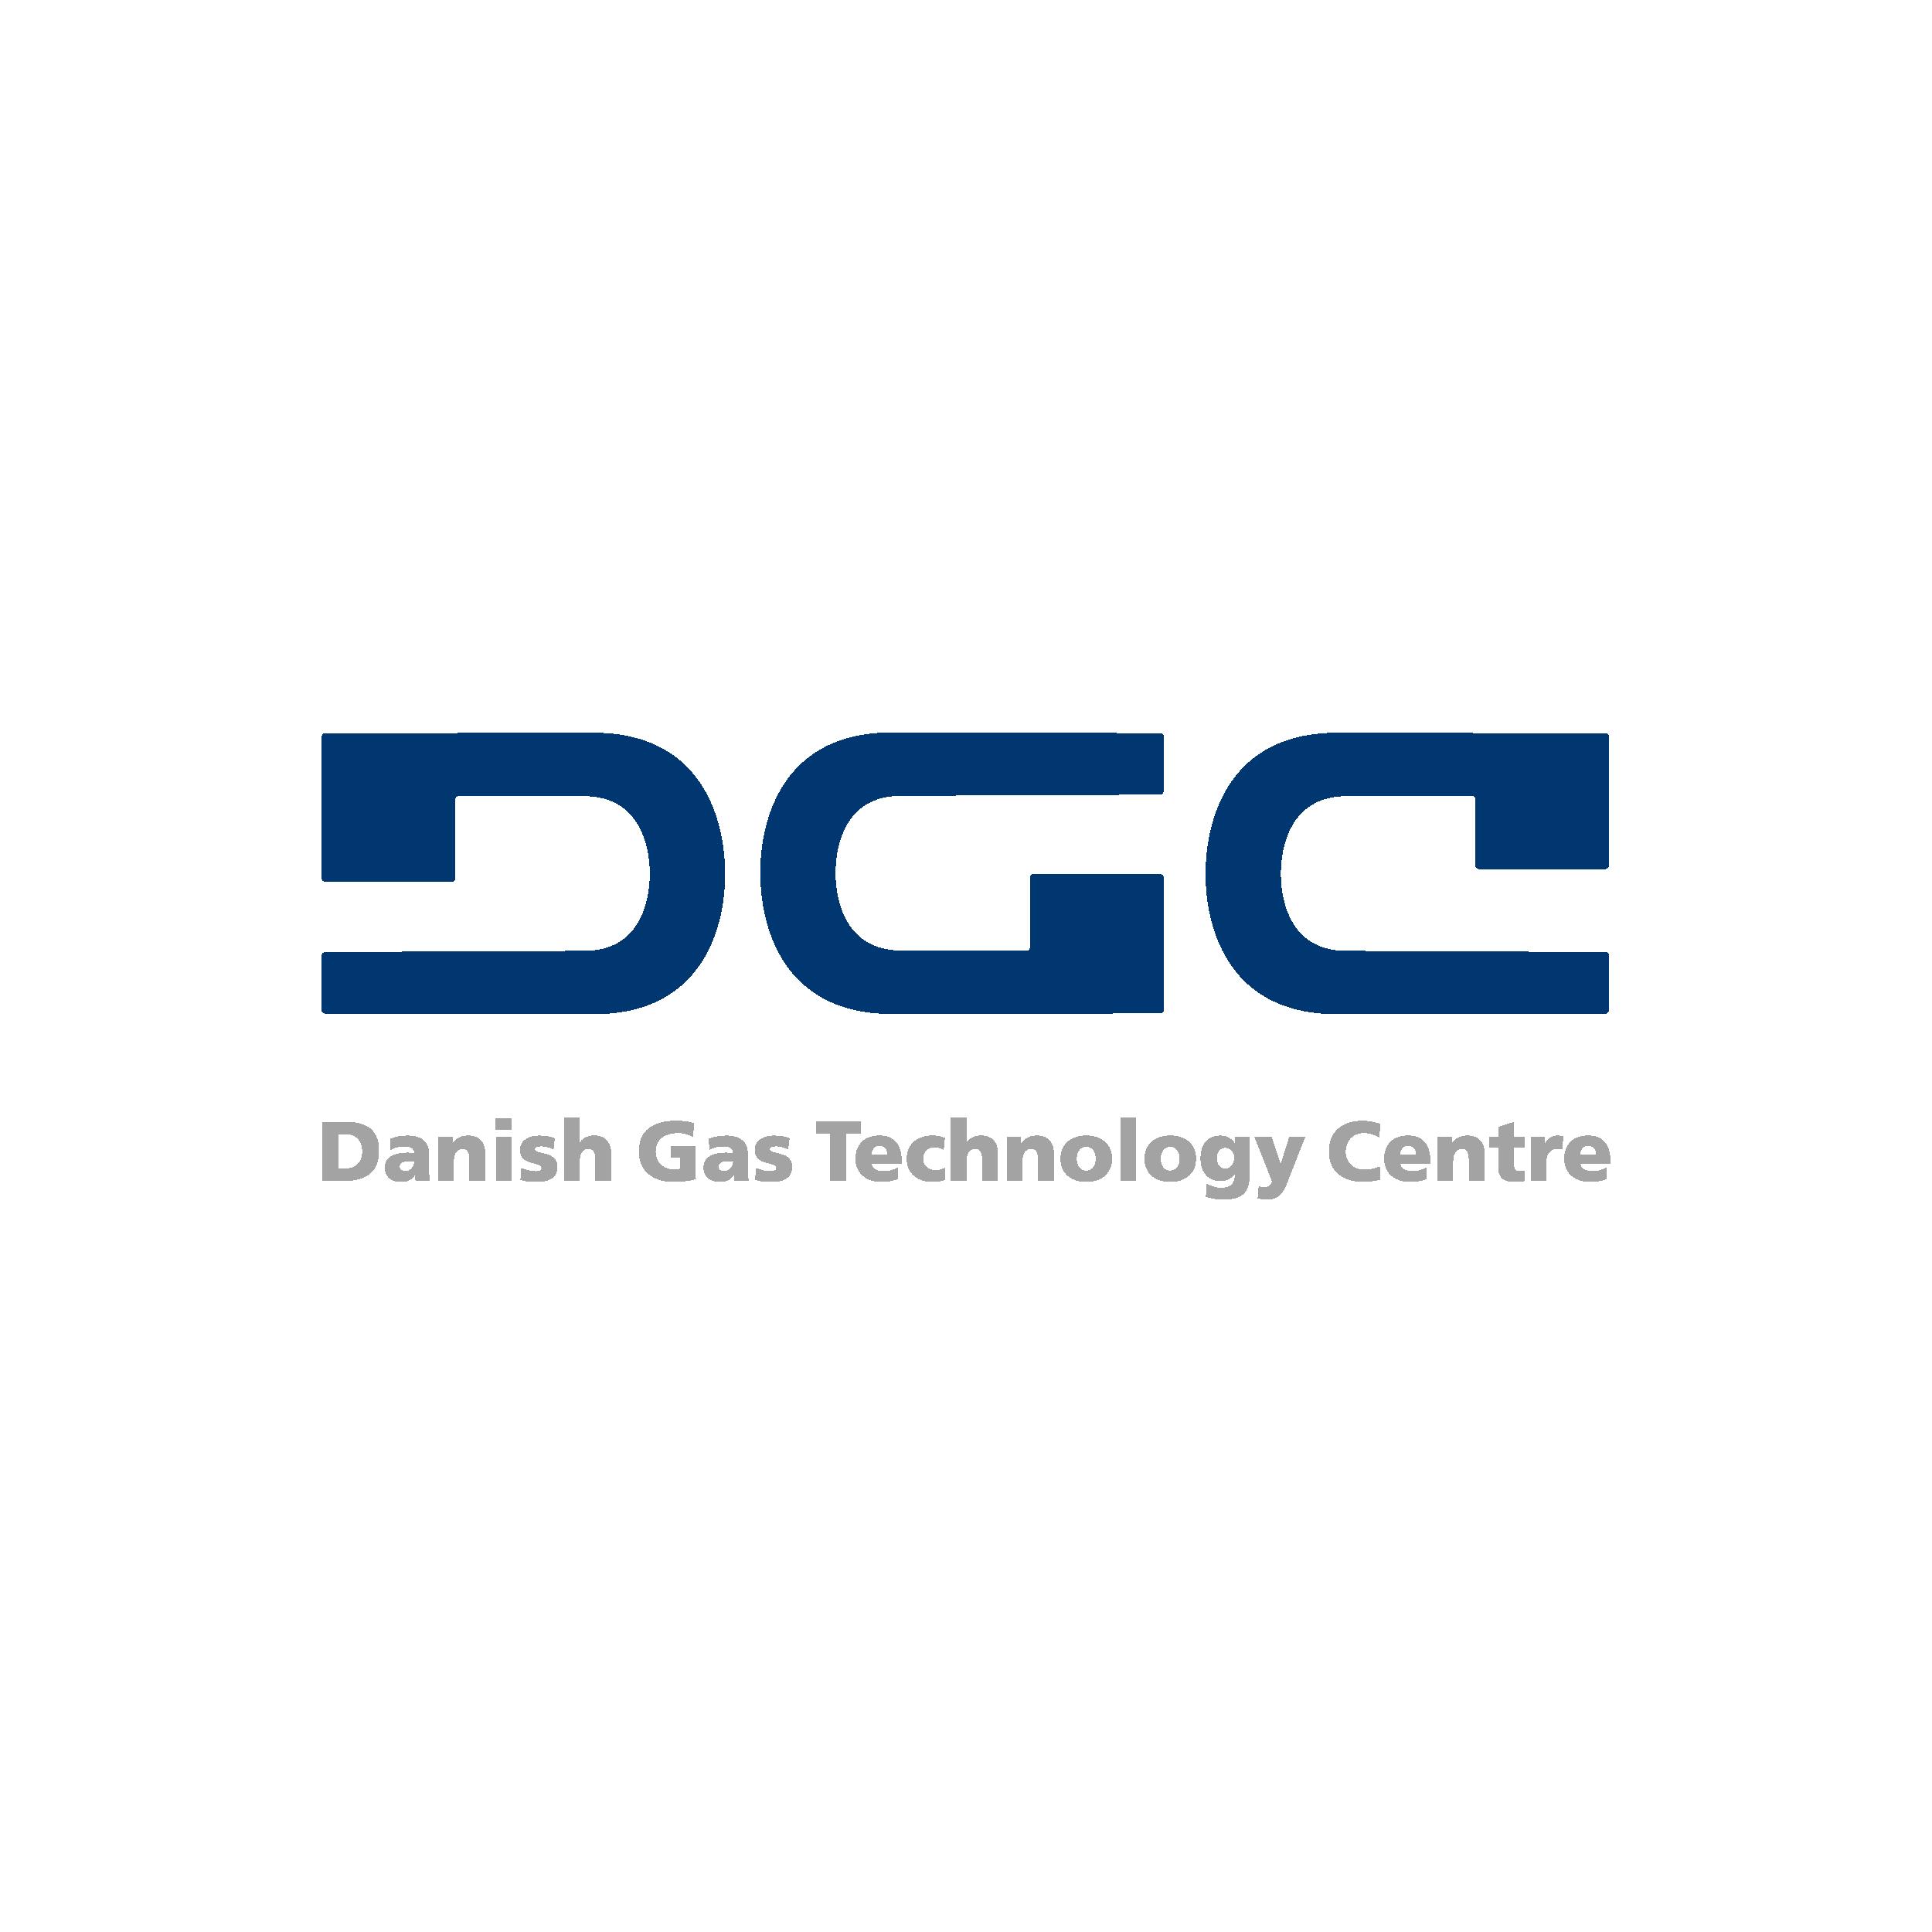 Danish Gas Technology Centre